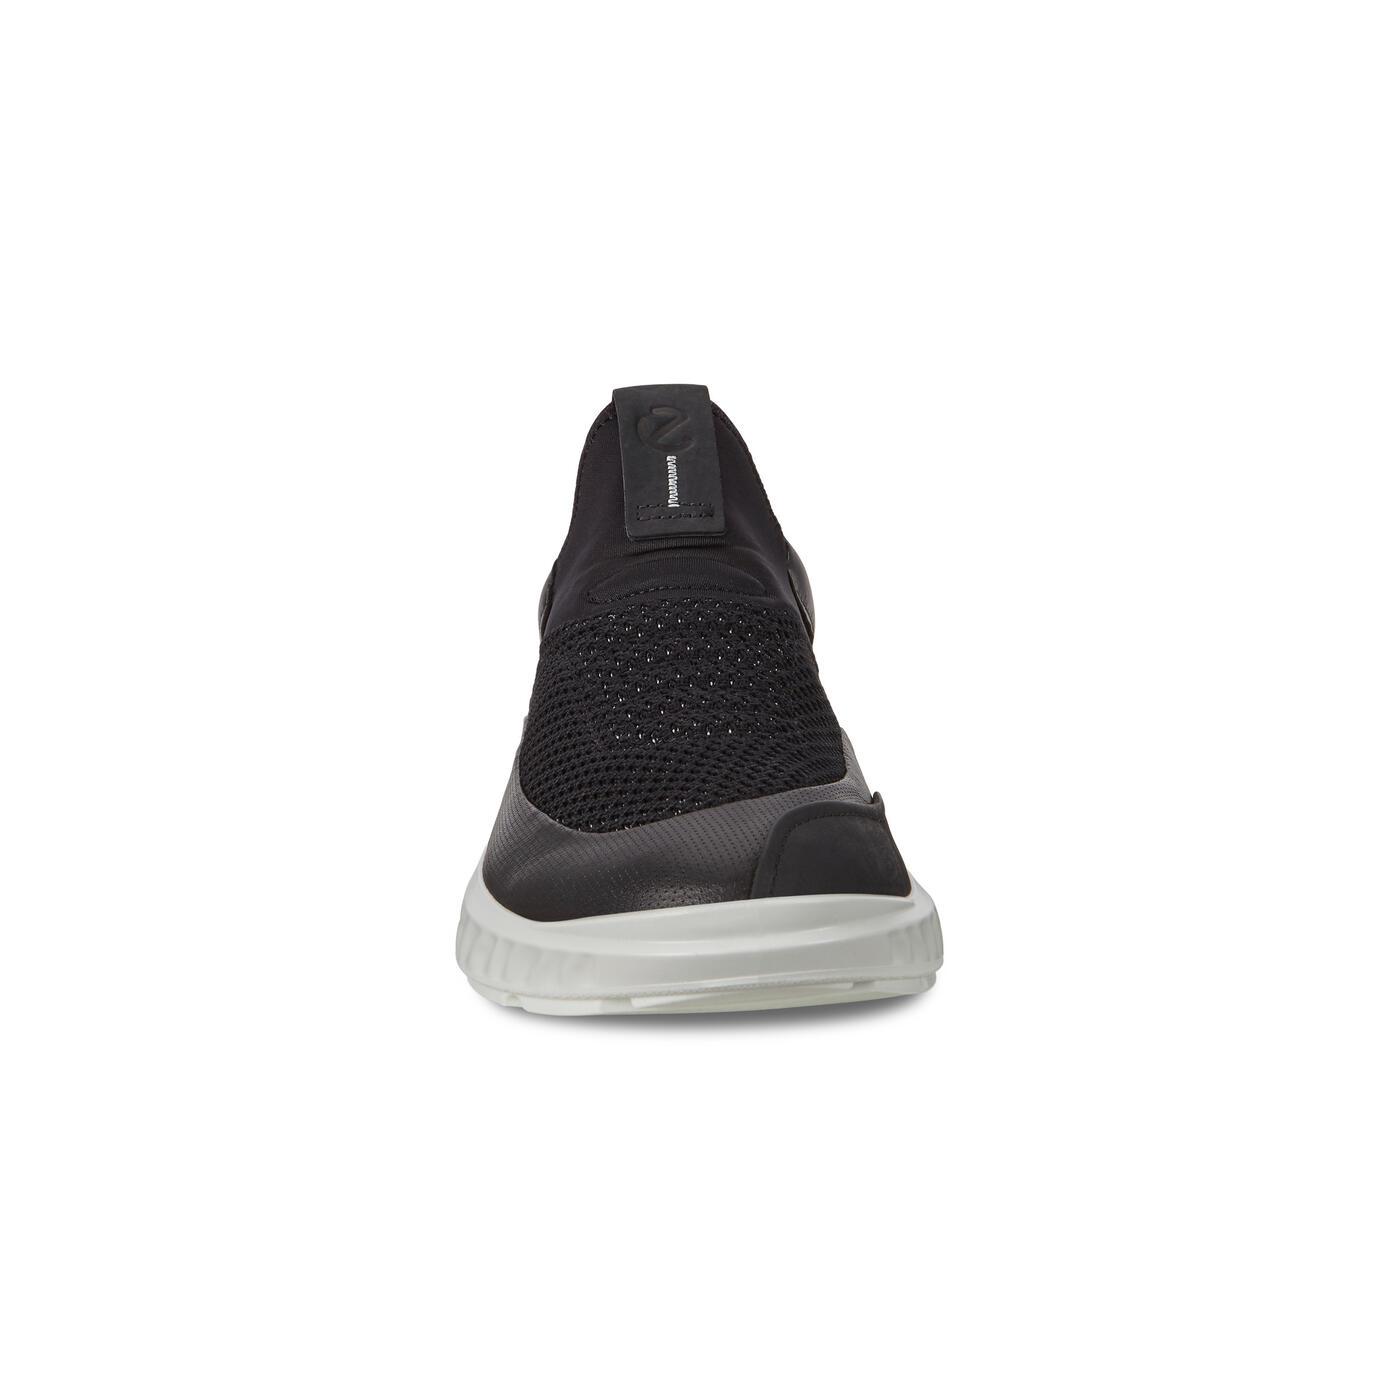 ECCO ST.1 Lite Men's Slip-On Sneakers